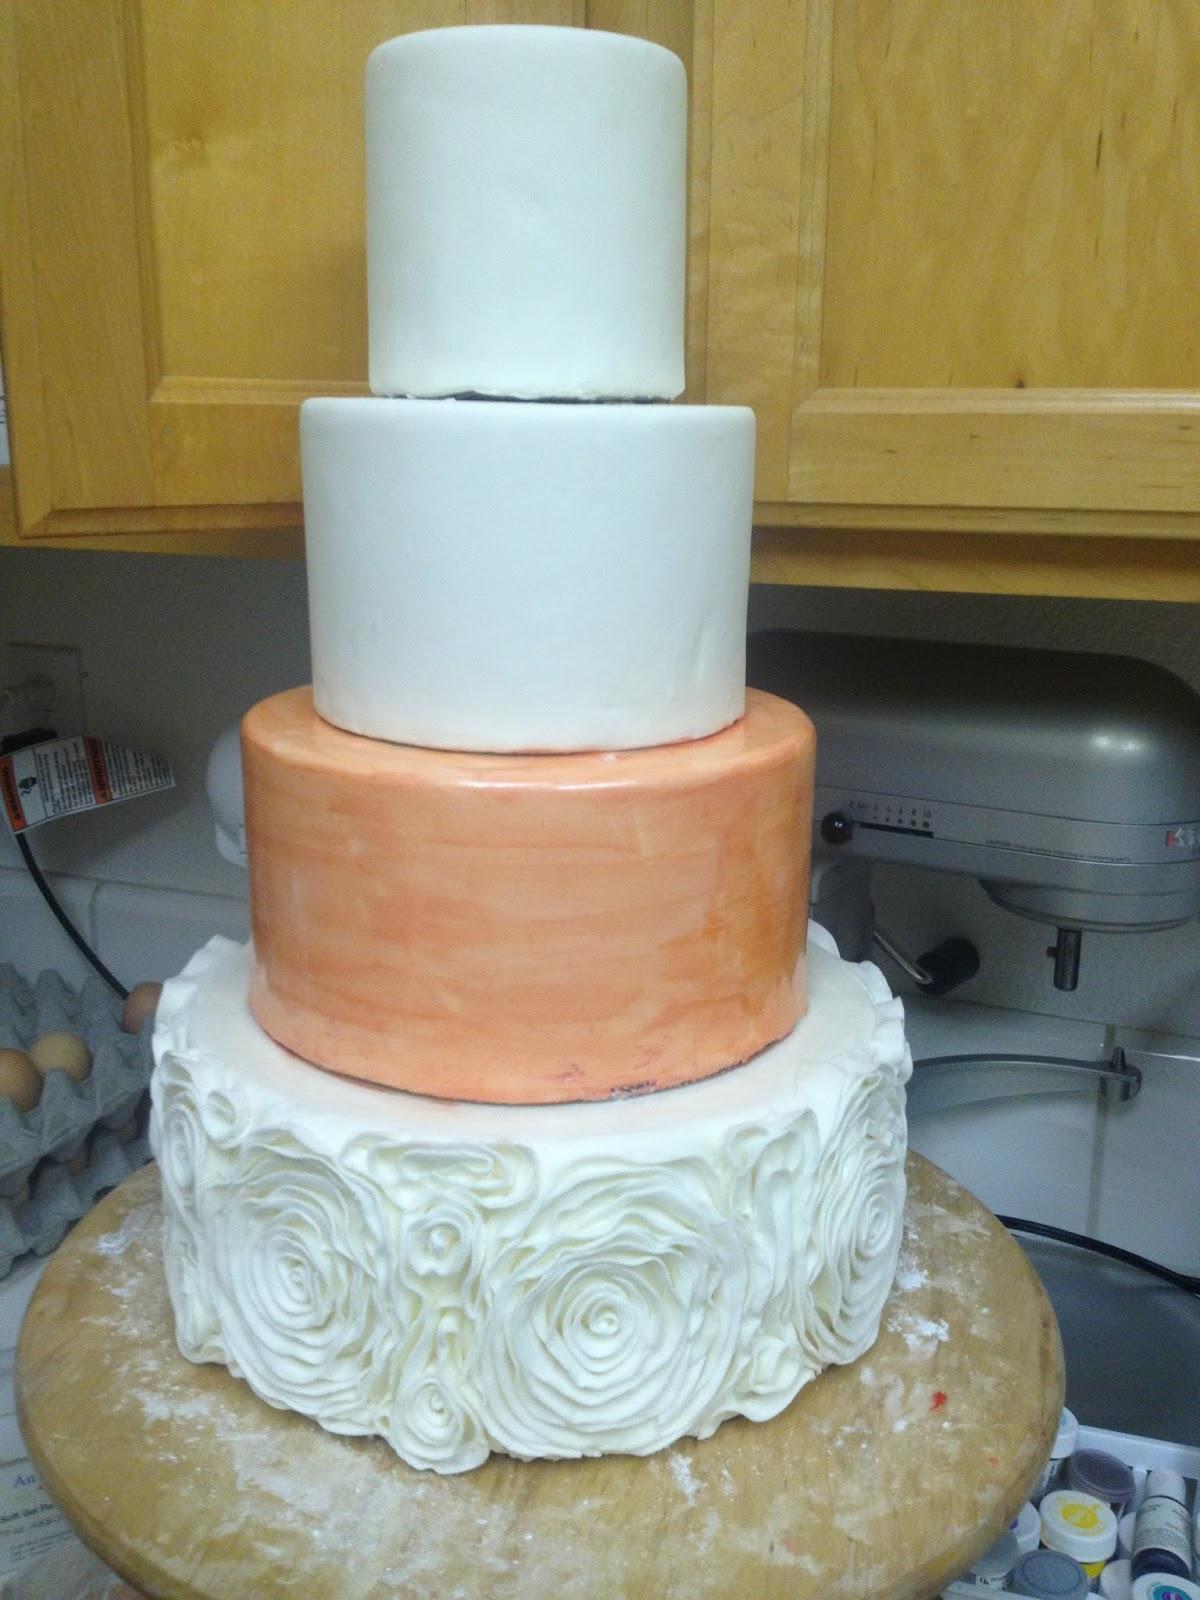 How To Make A Dummy Cake